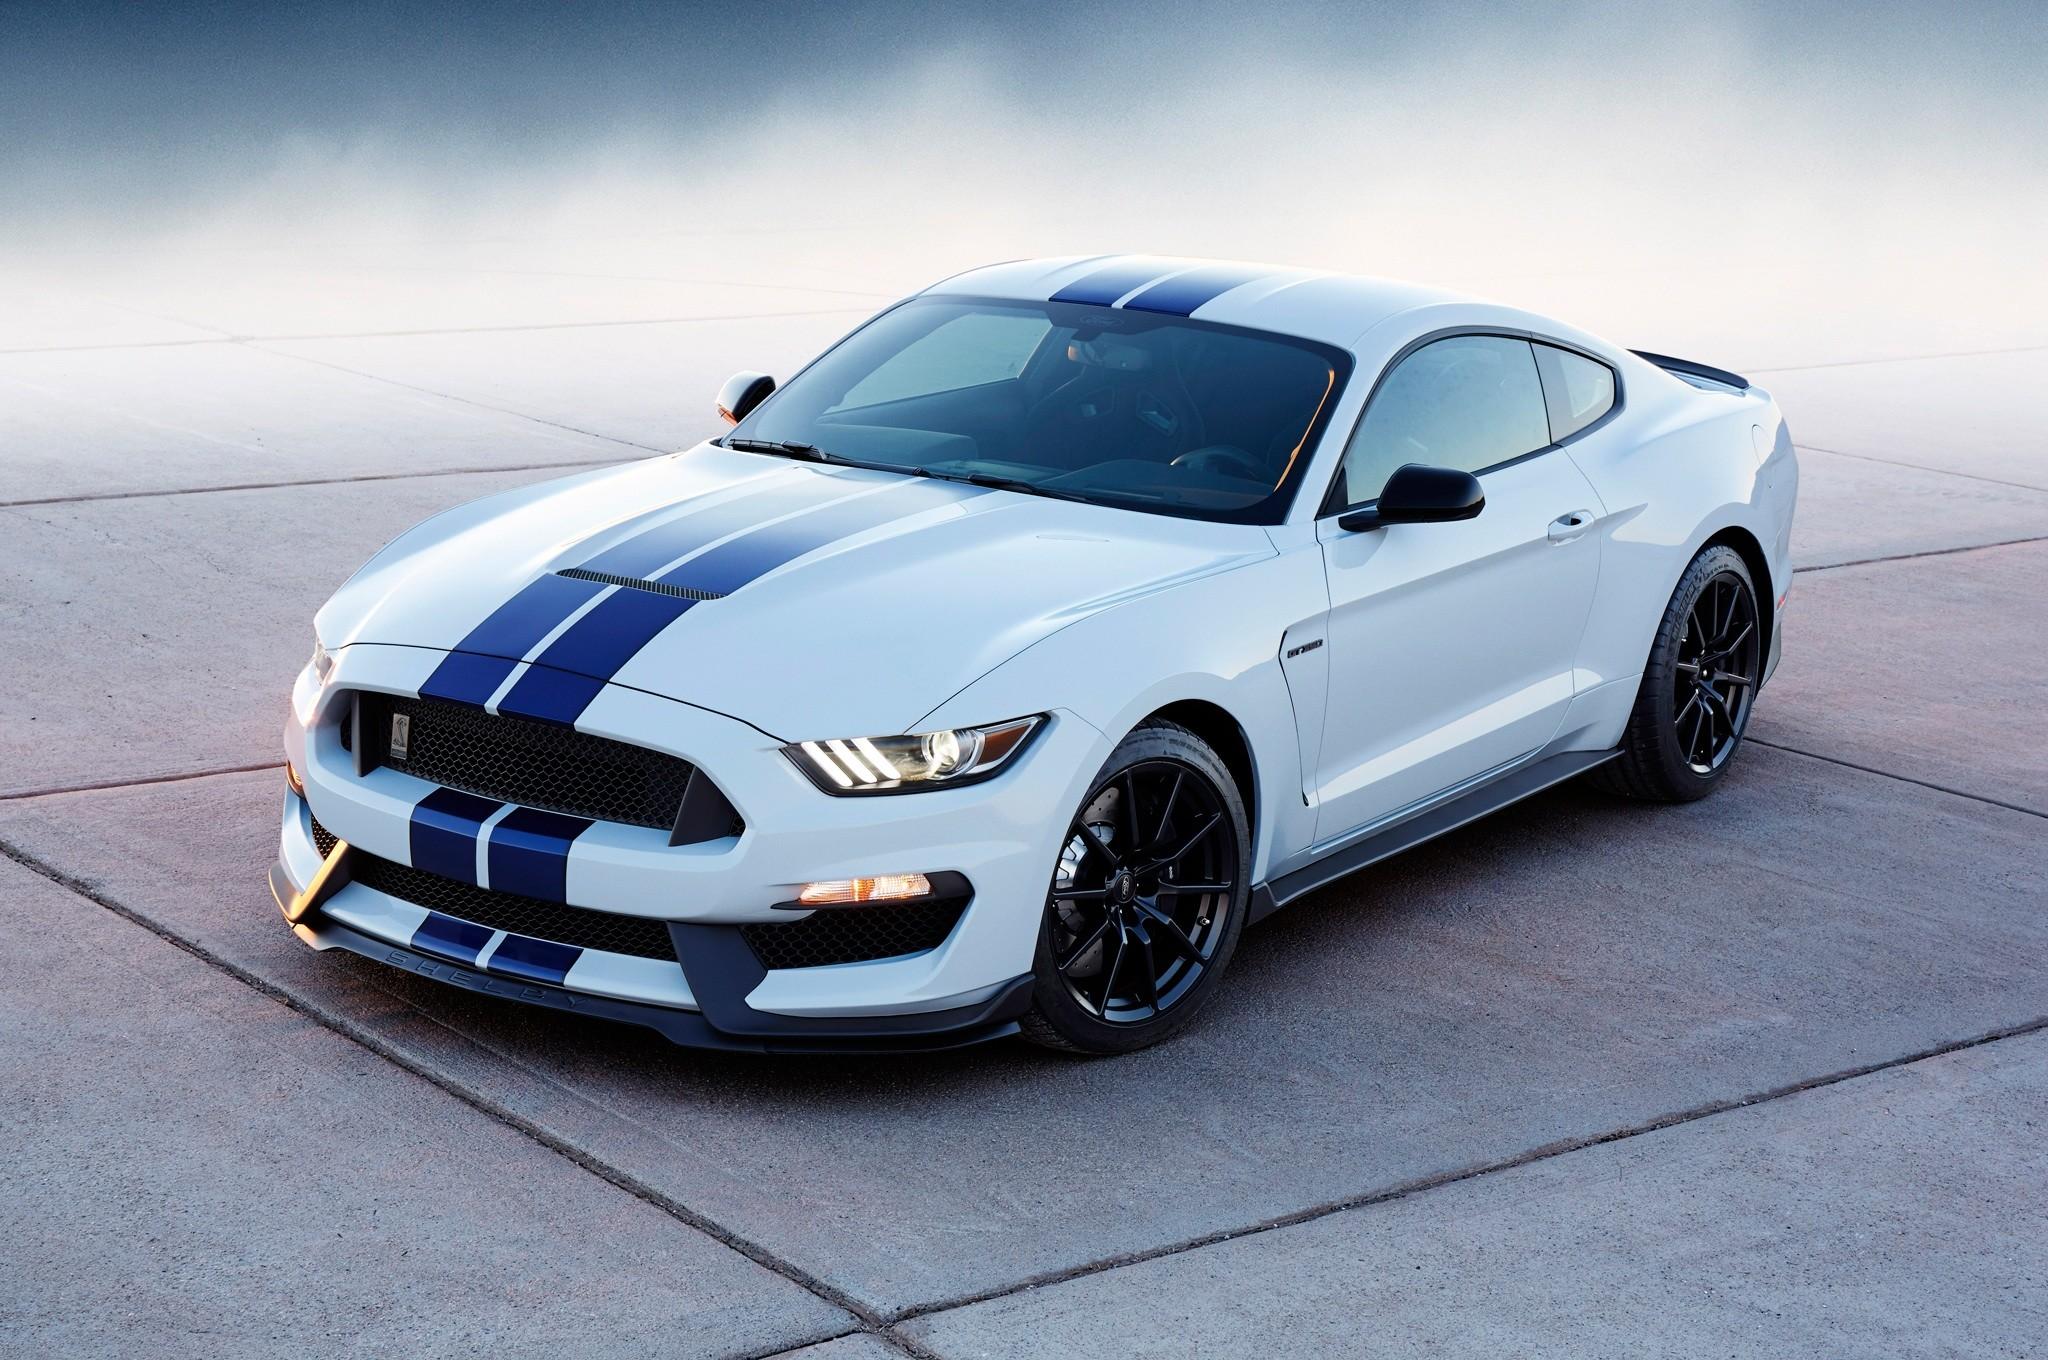 Res: 2048x1360, Sports Car Mustang Ford – 4k Wallpaper